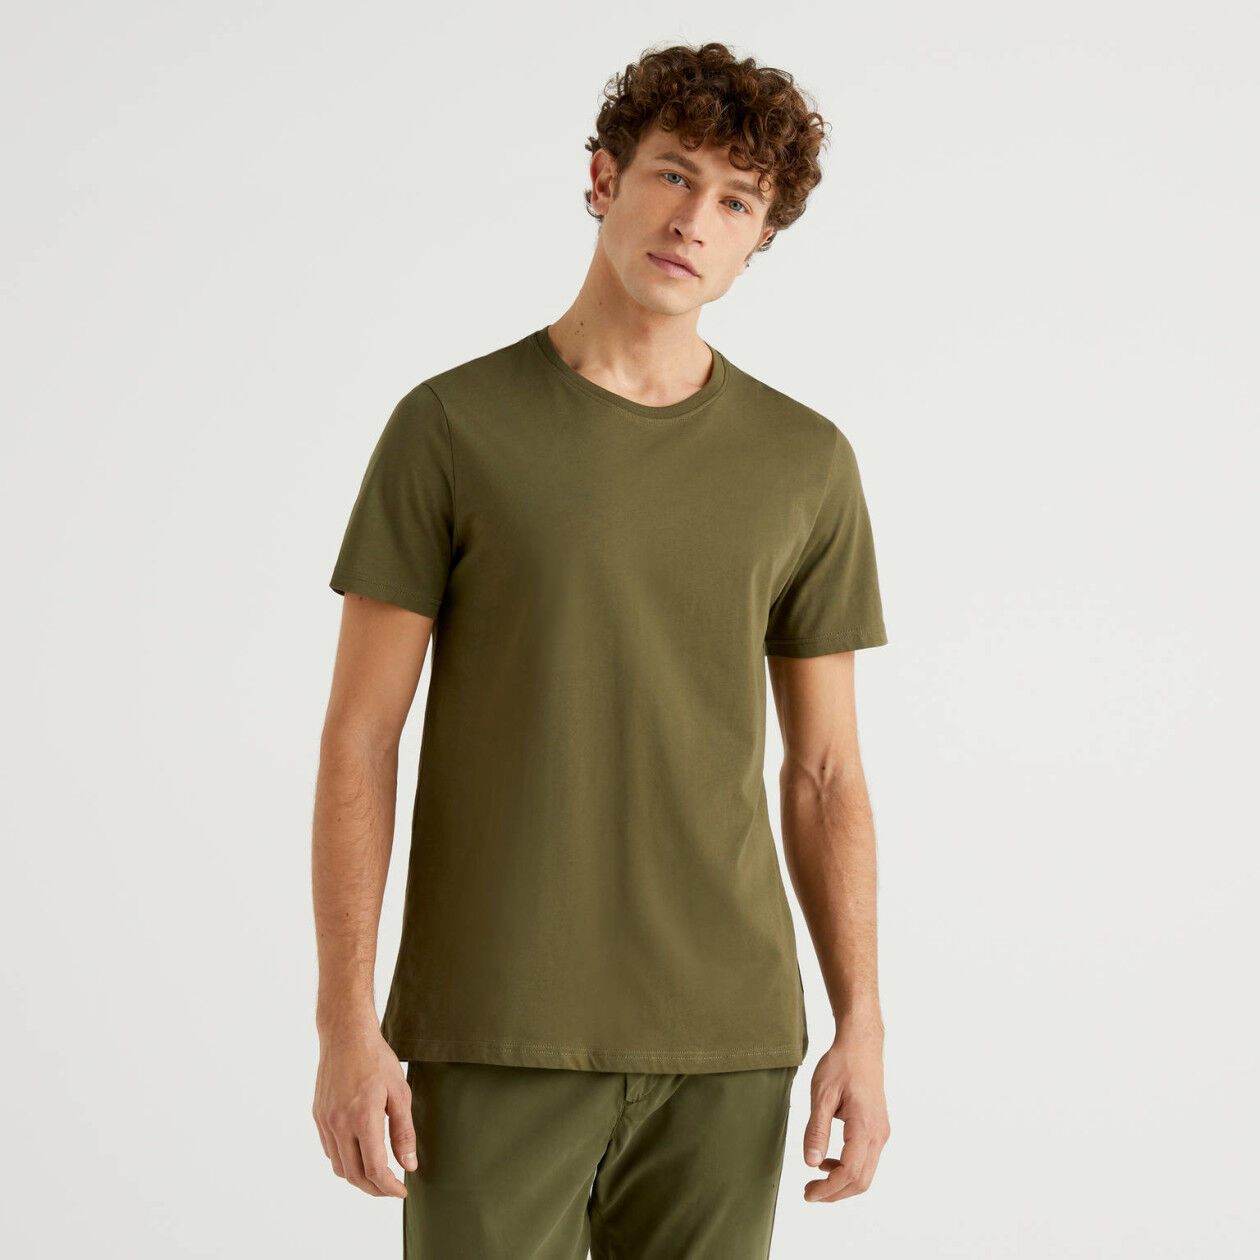 Camiseta verde militar de algodón puro